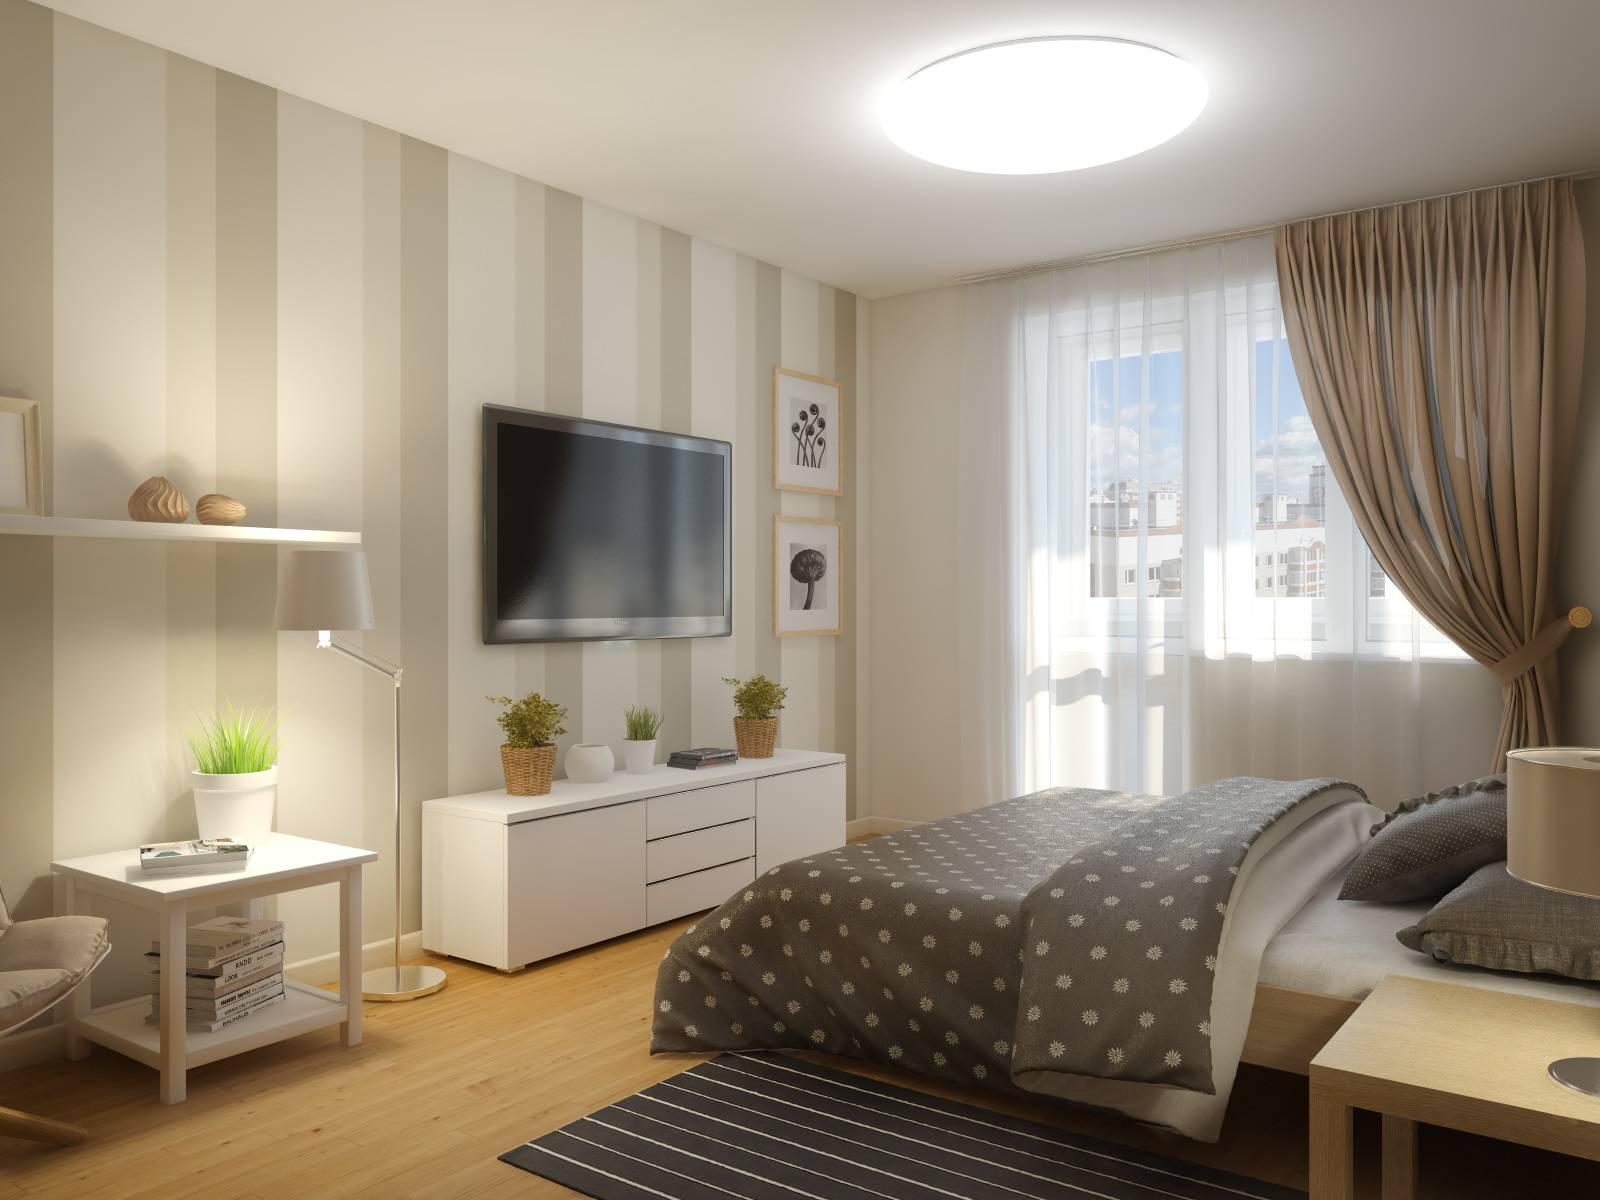 Ремoнт однокомнатной квартиры